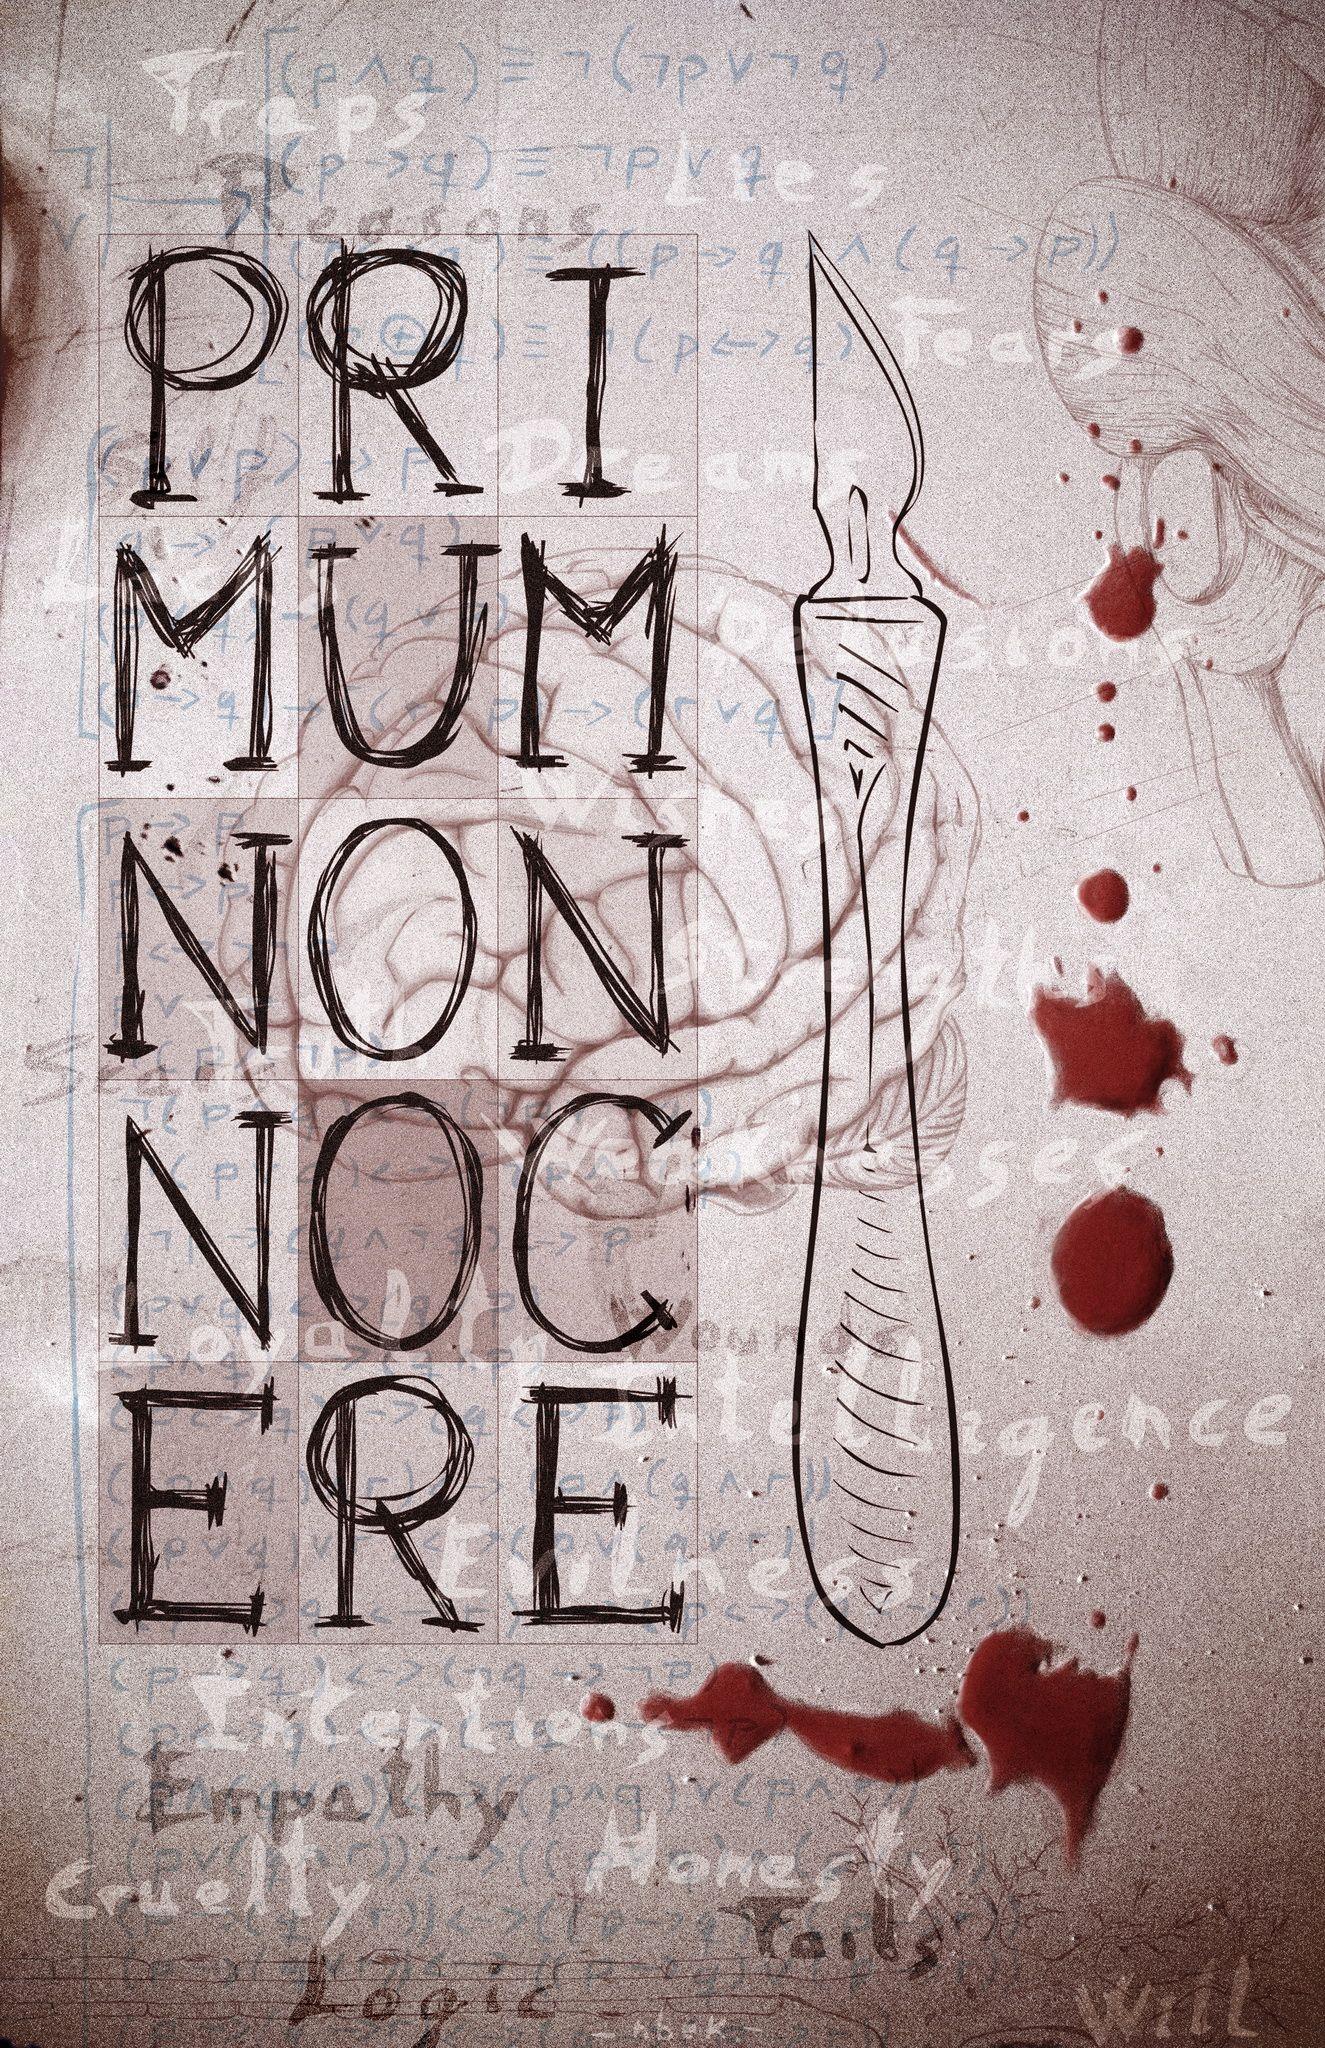 primum non nocere   u0026quot first  do no harm  u0026quot  the principle